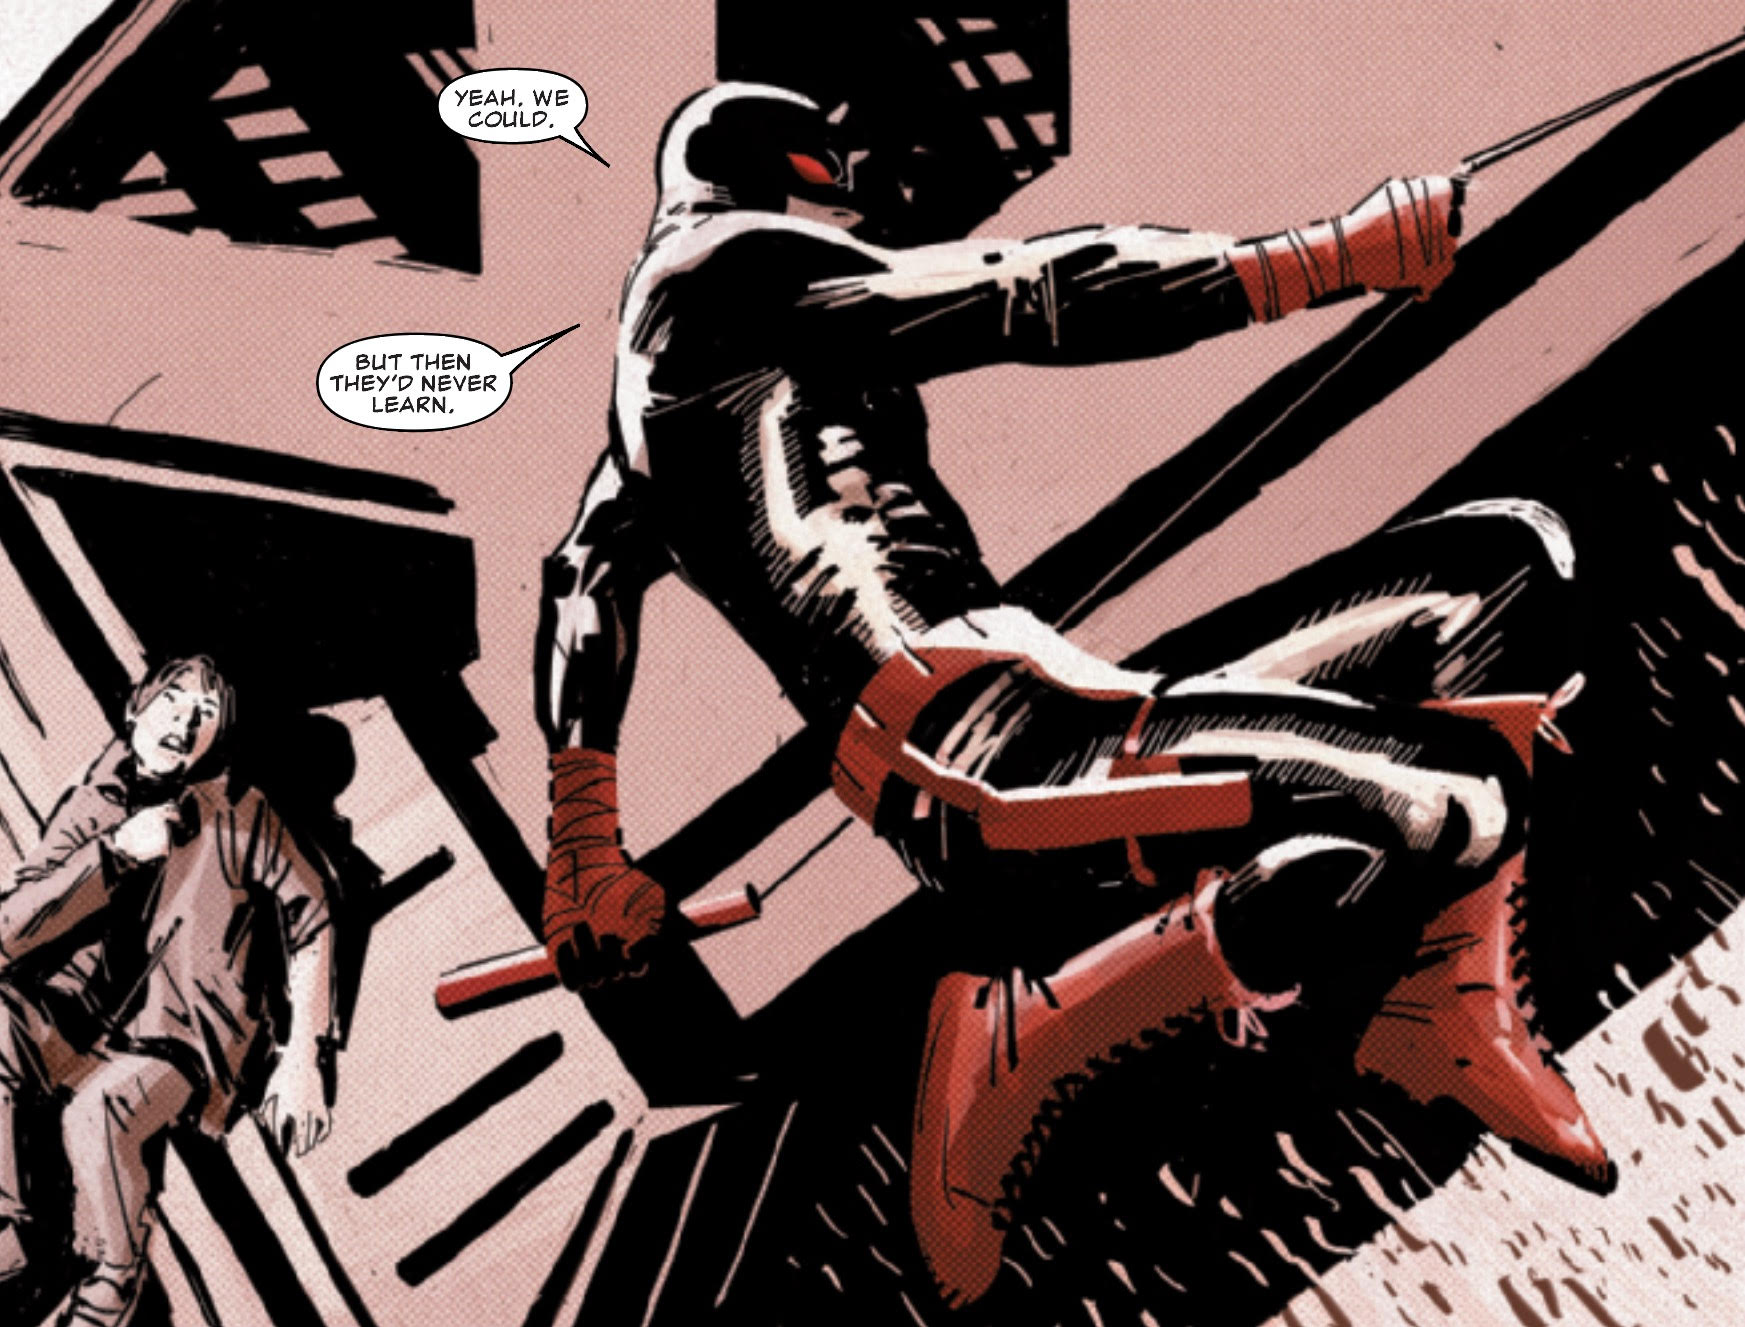 Daredevil #1 - Ron Garney